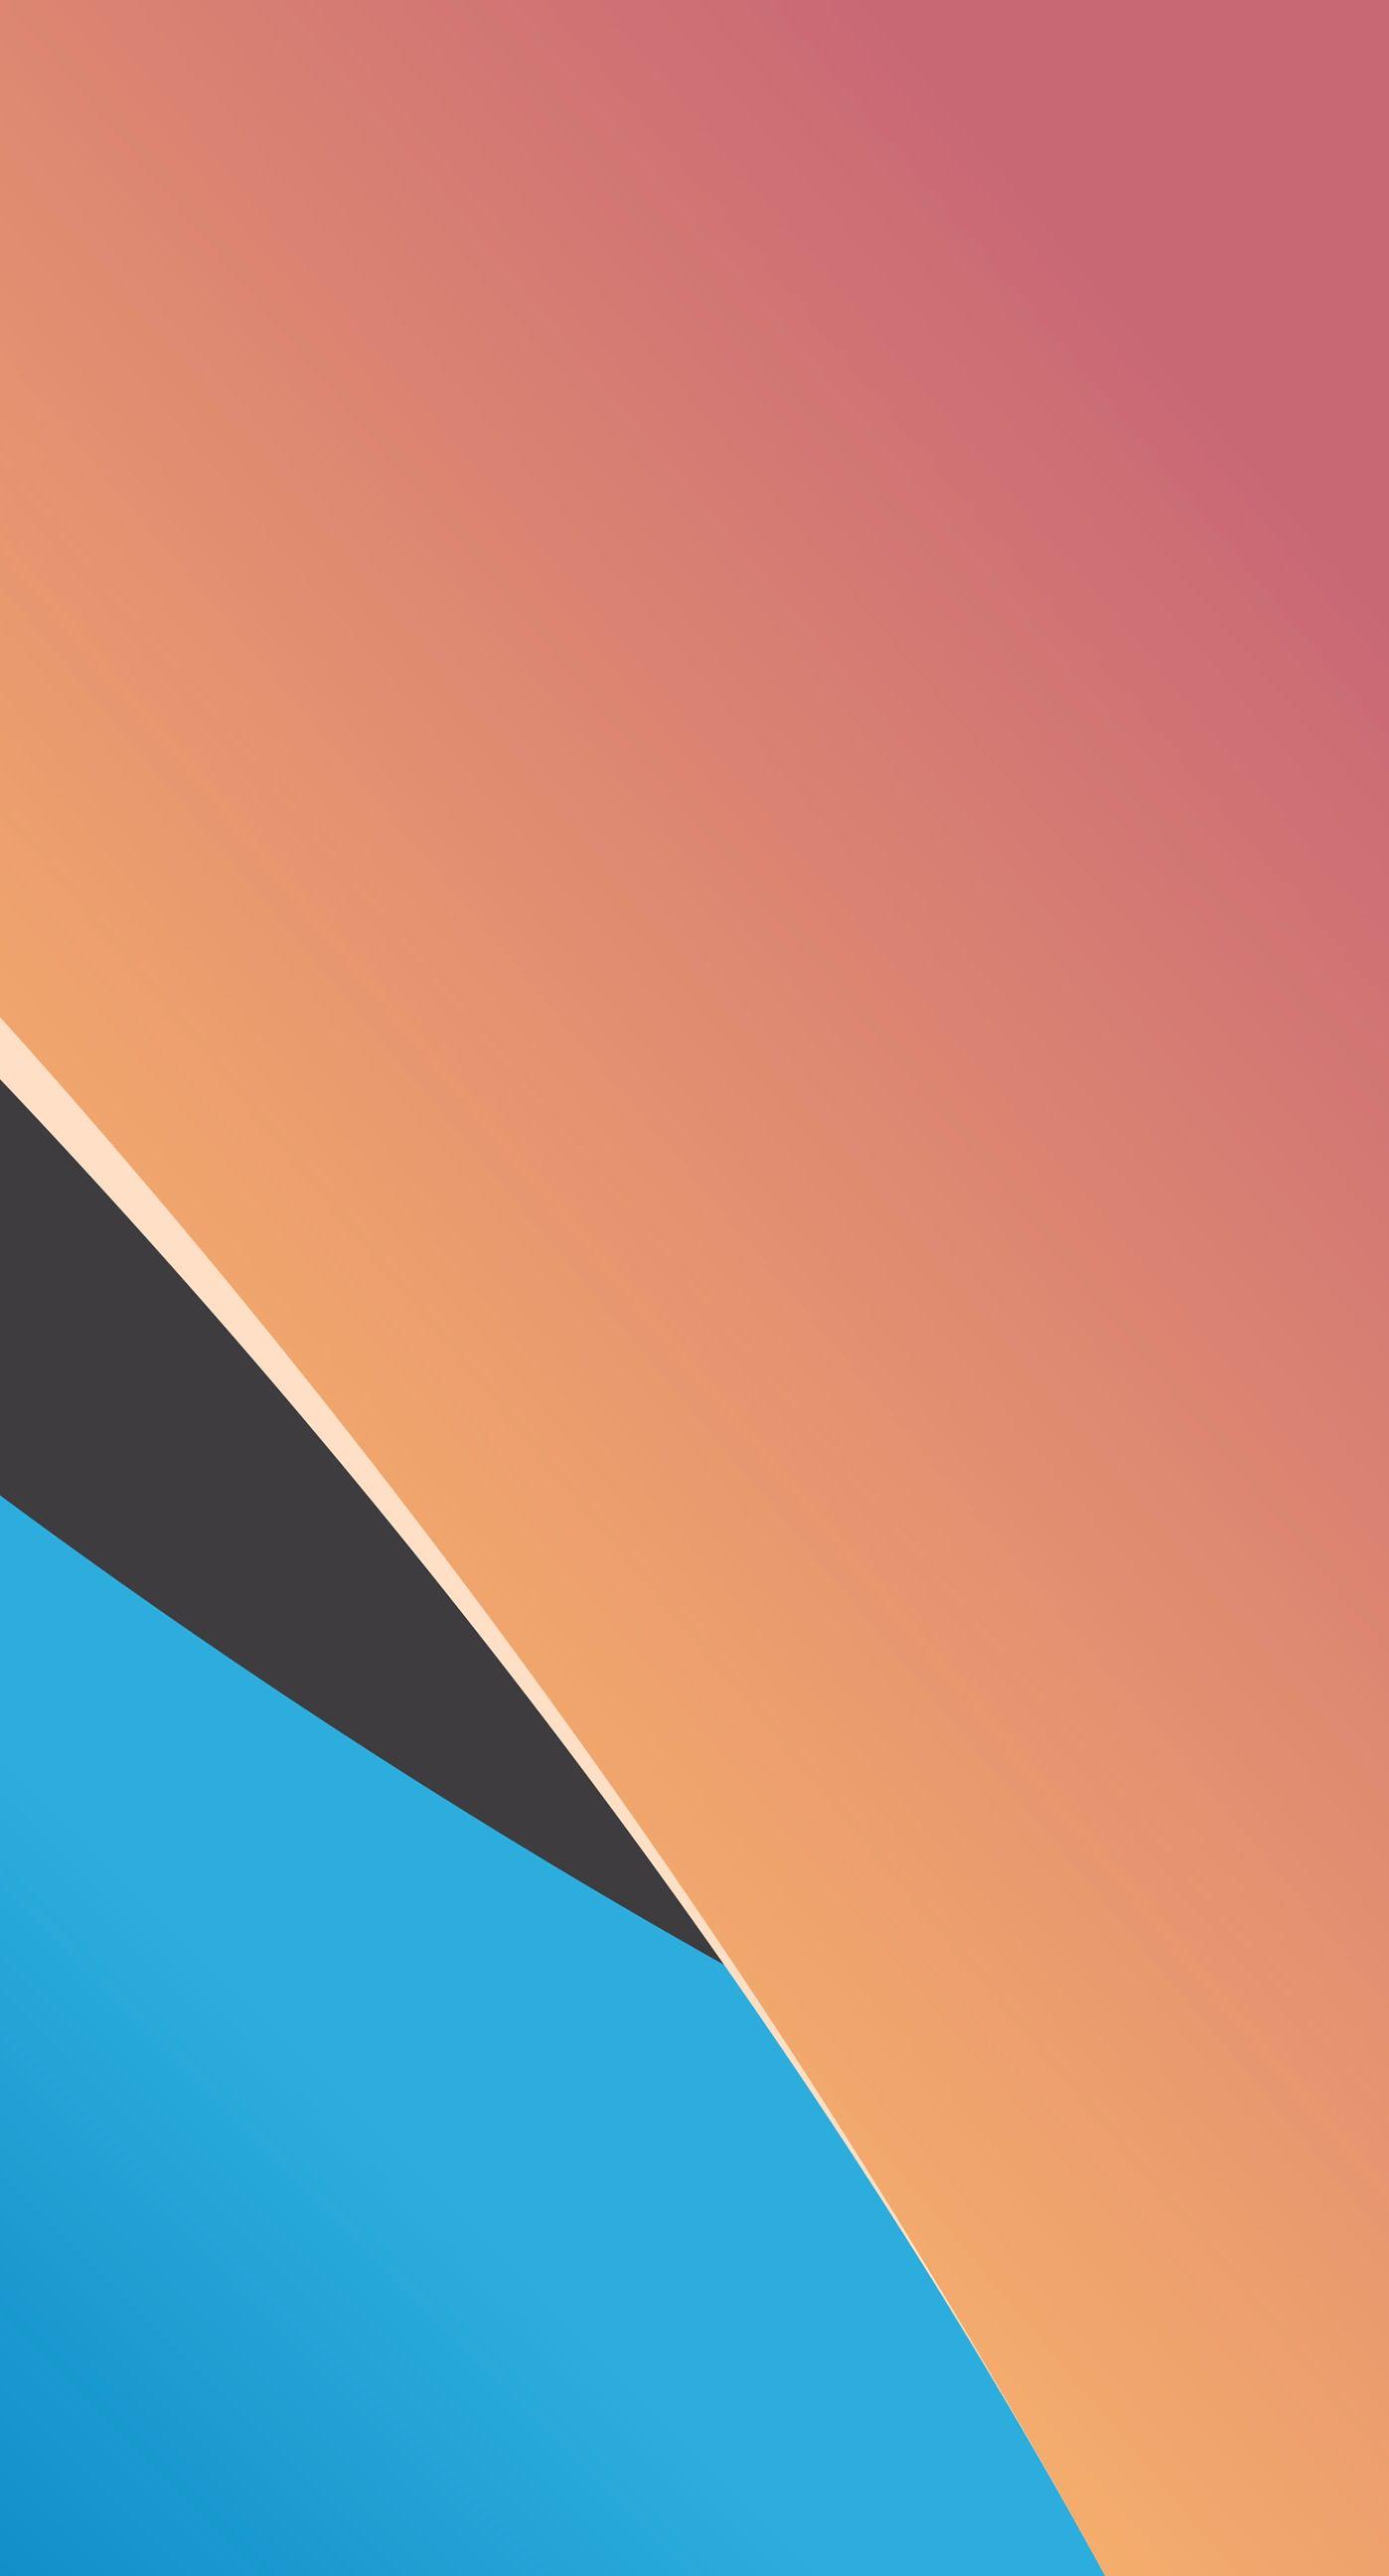 Pattern red black blue wallpapersc iPhone7Plus 1398x2592